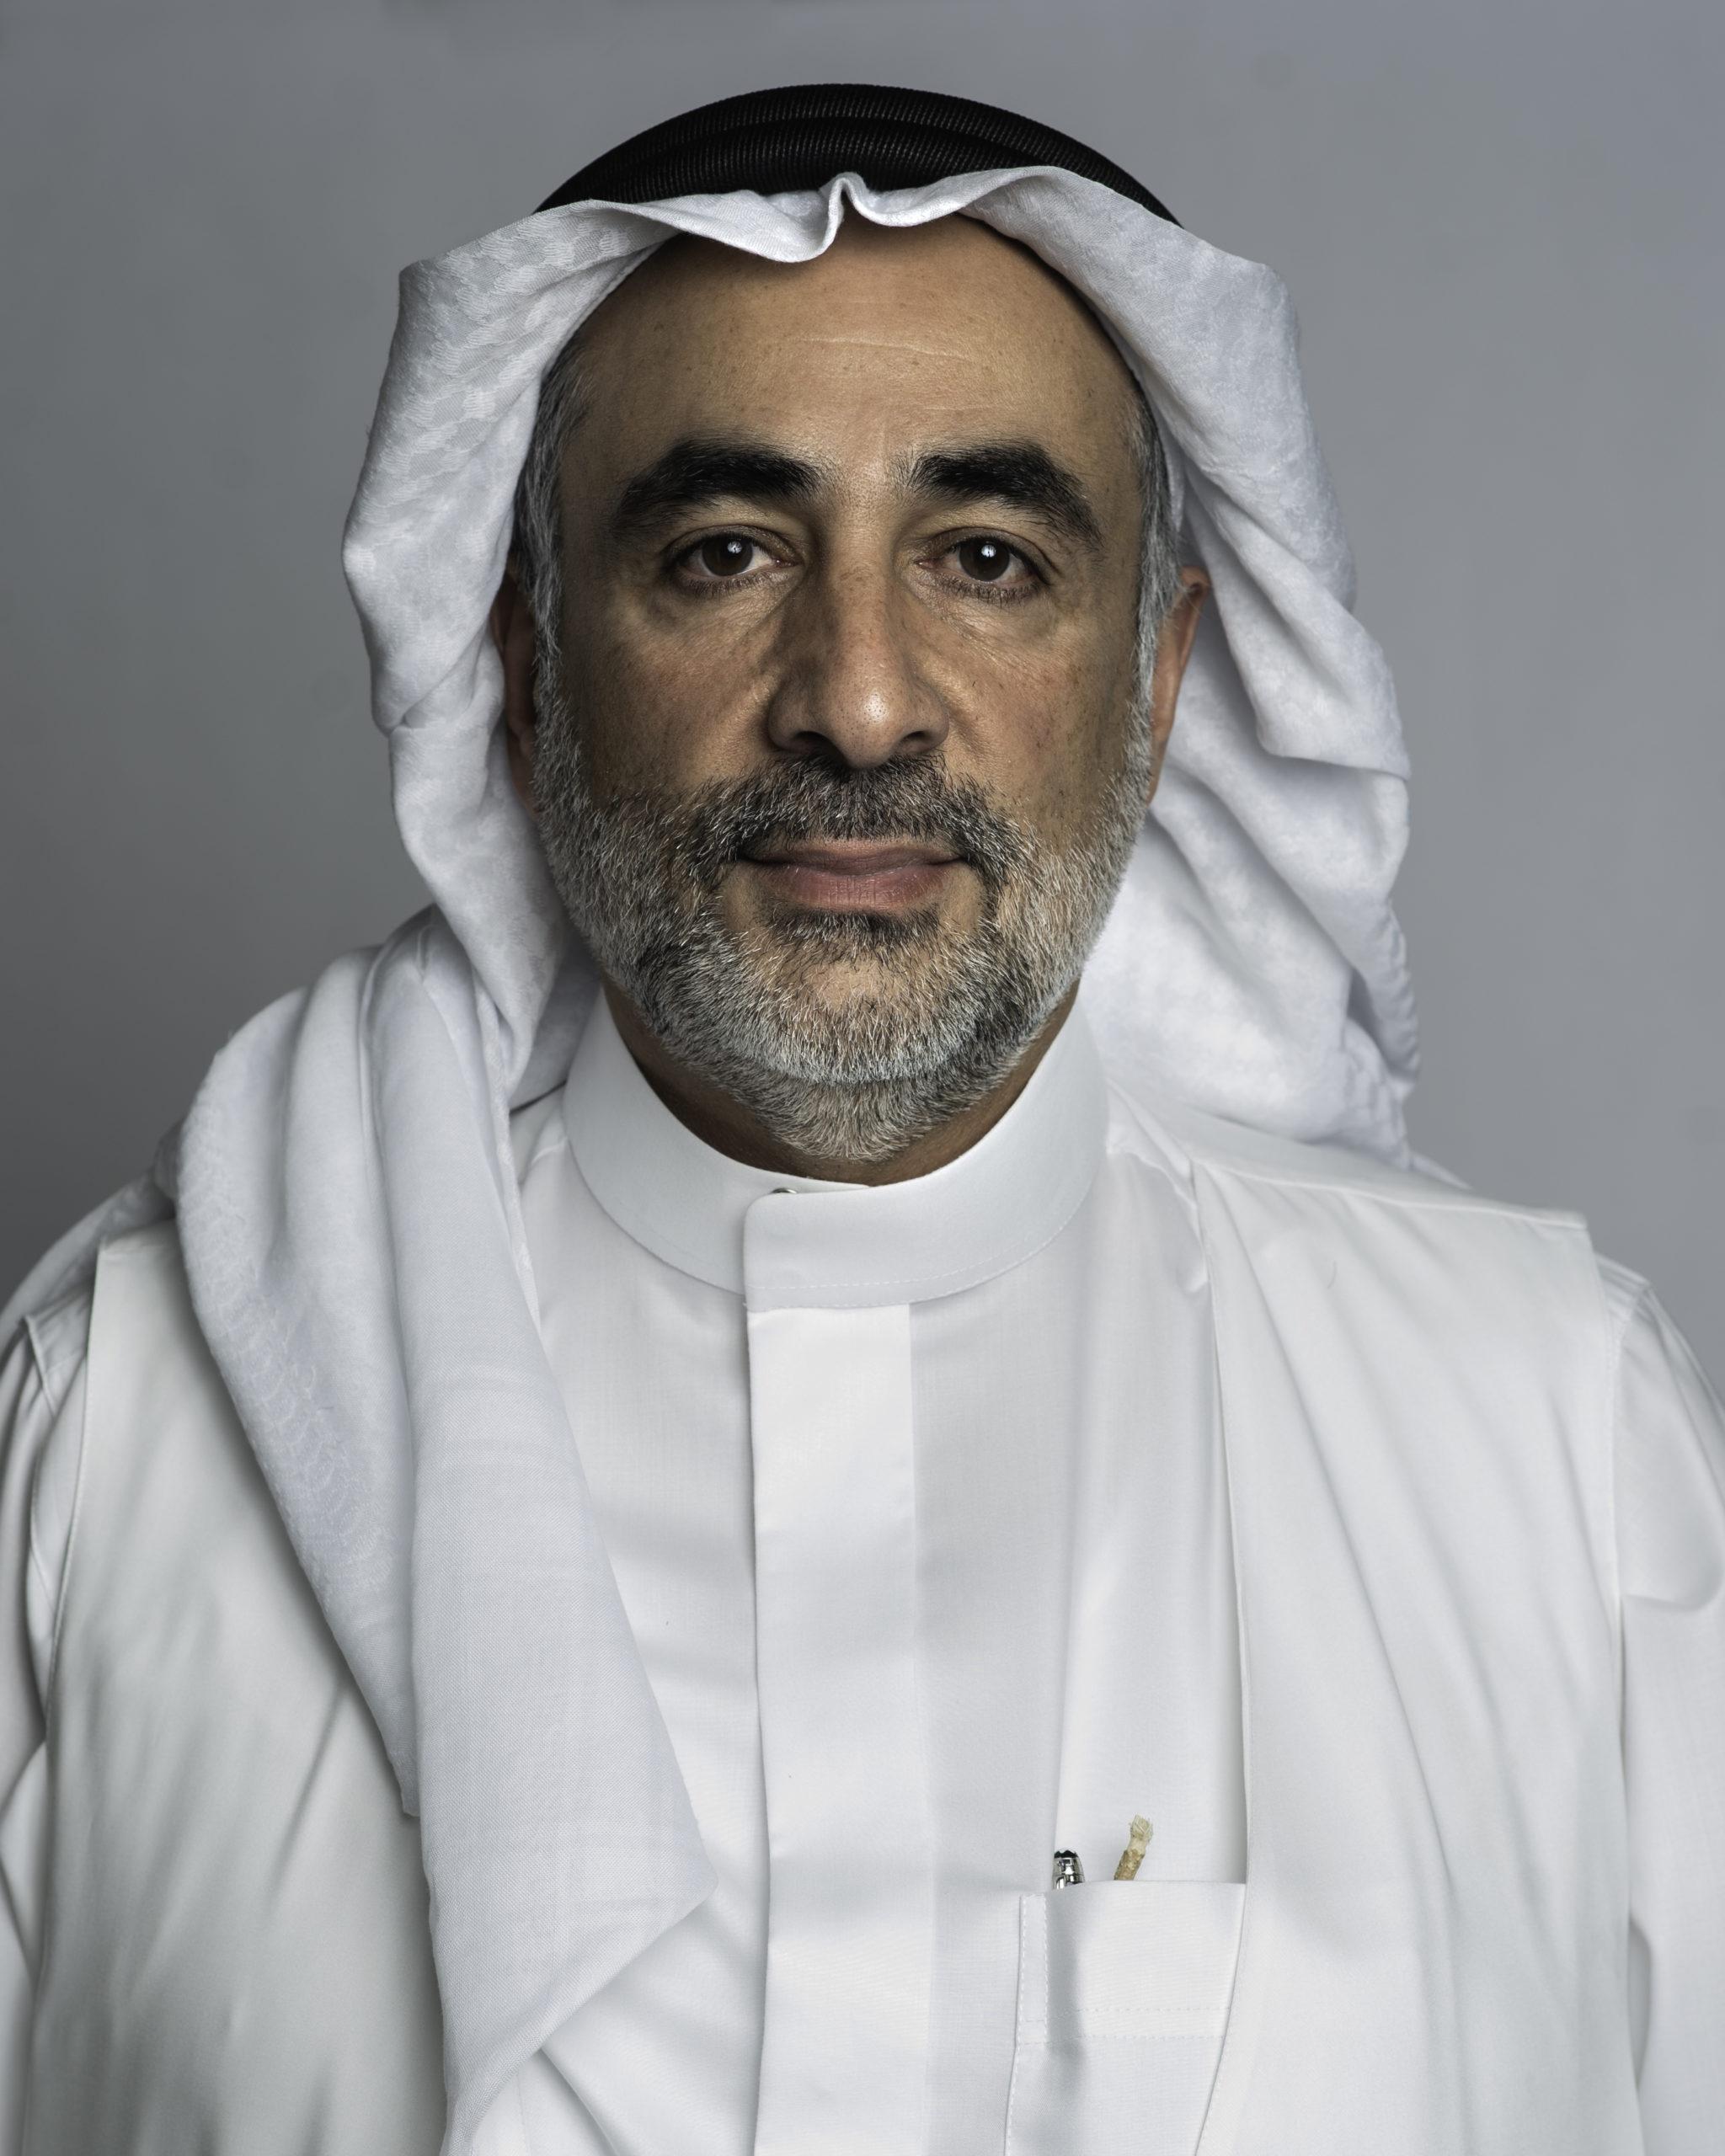 Mr. Saud Abulaziz Al Suliman